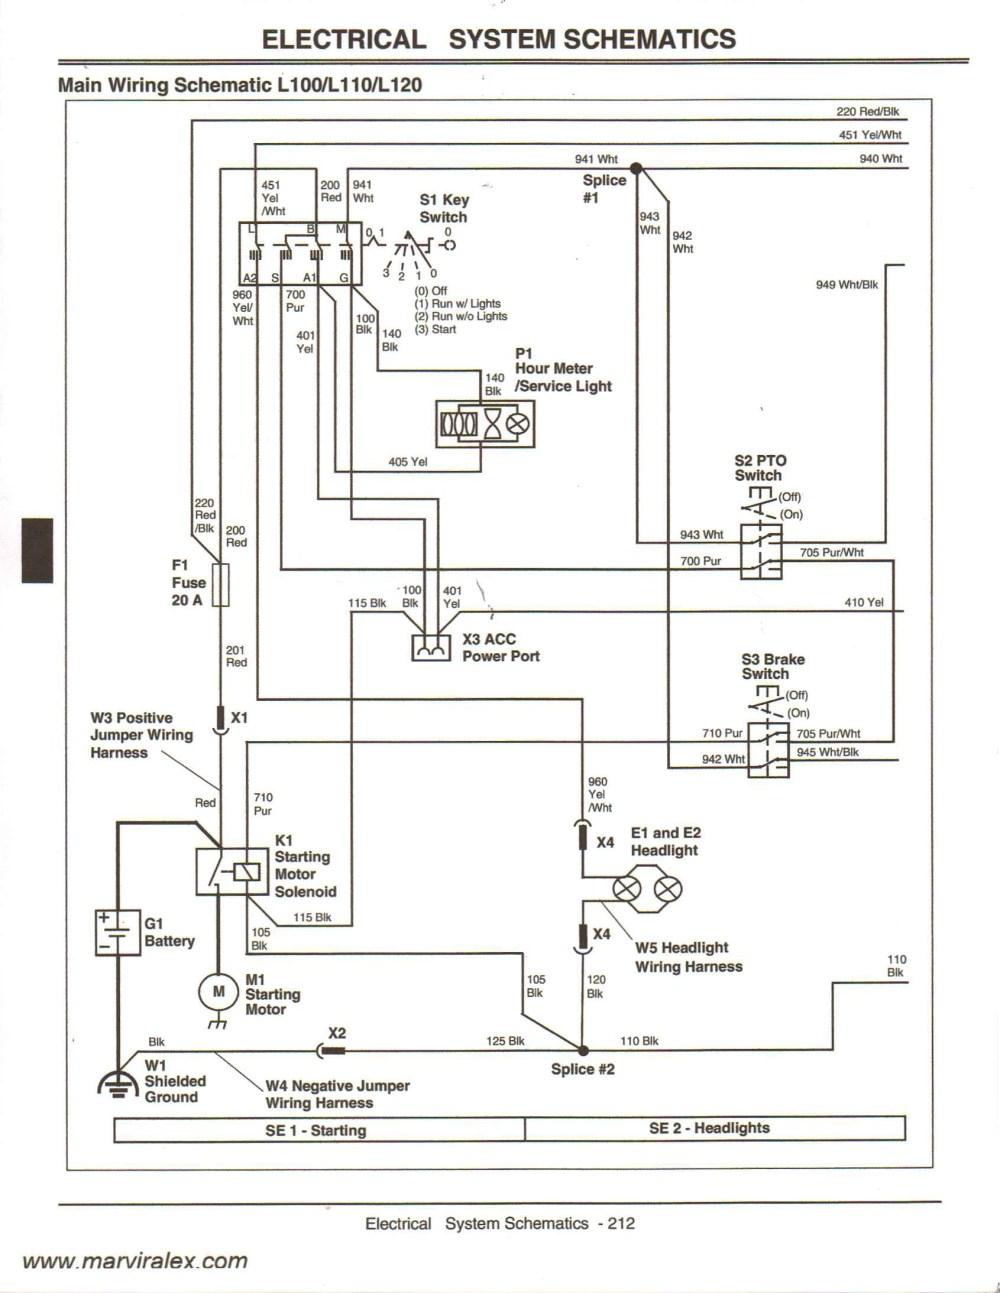 medium resolution of john deere lt155 wiring schematic wiring diagram for john deere lt155 best pto switch wiring